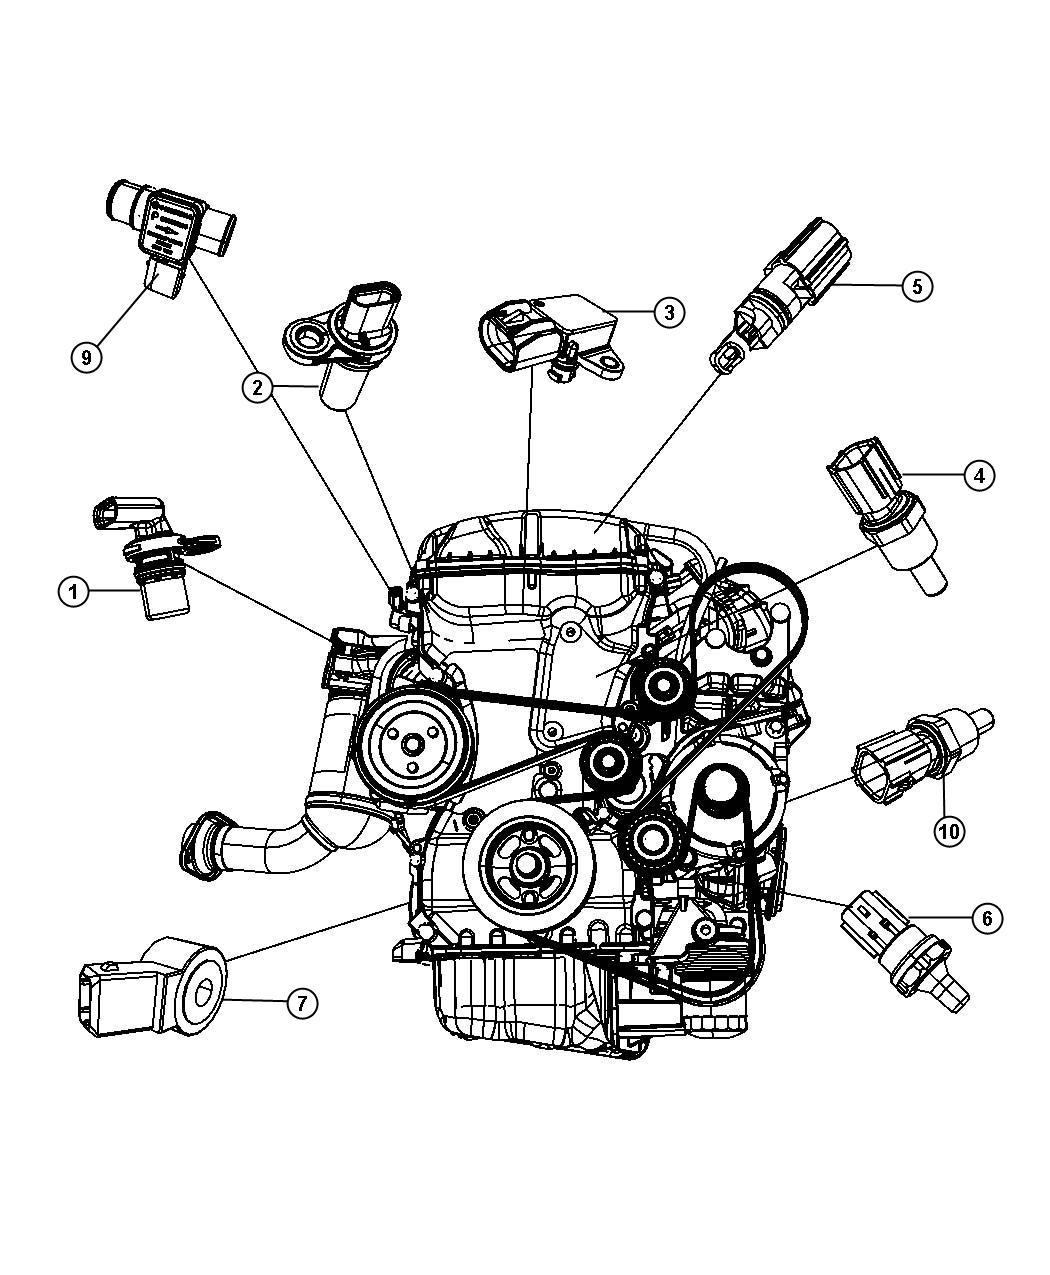 Sensors, Engine